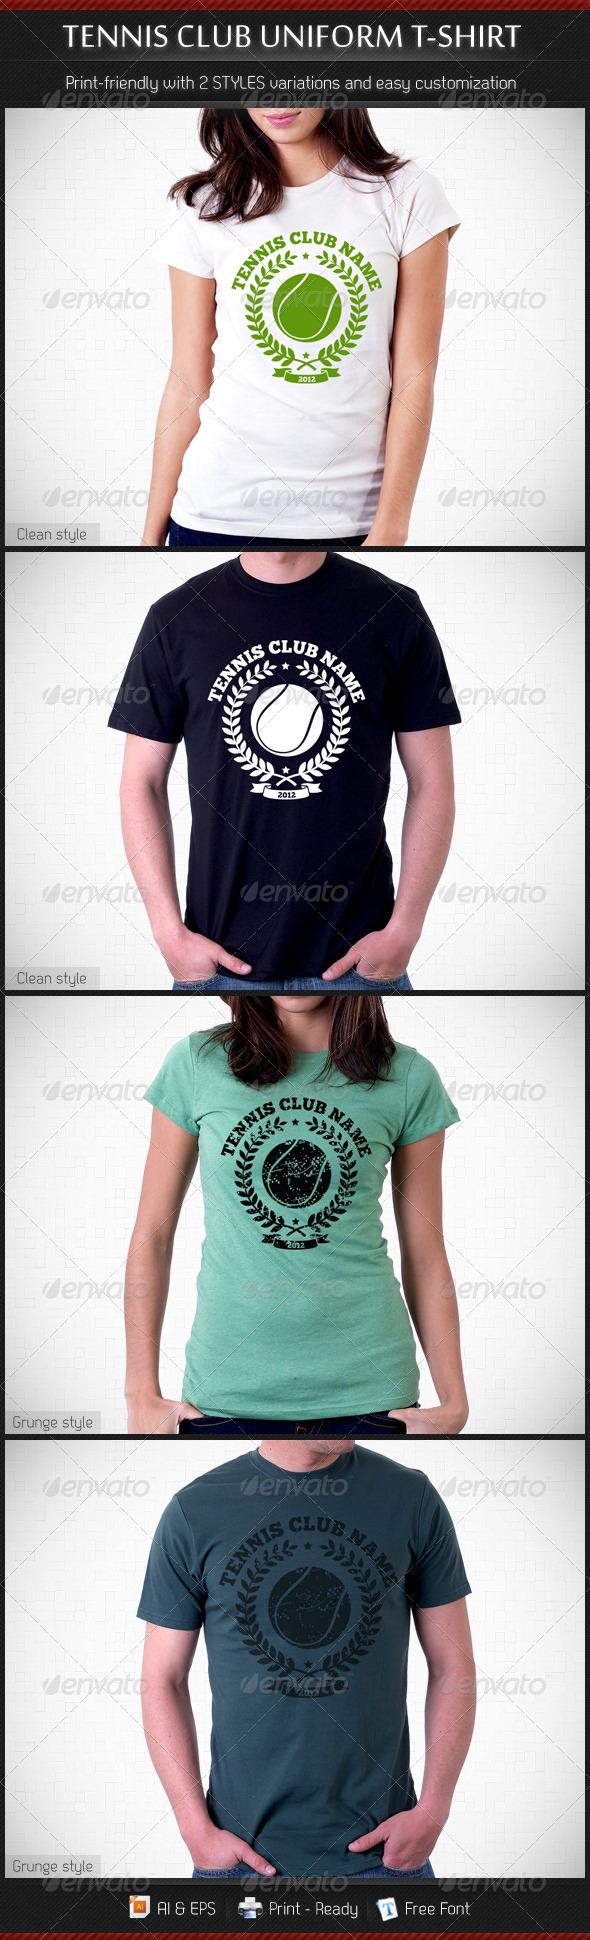 Tennis Club Uniform T-Shirt Template